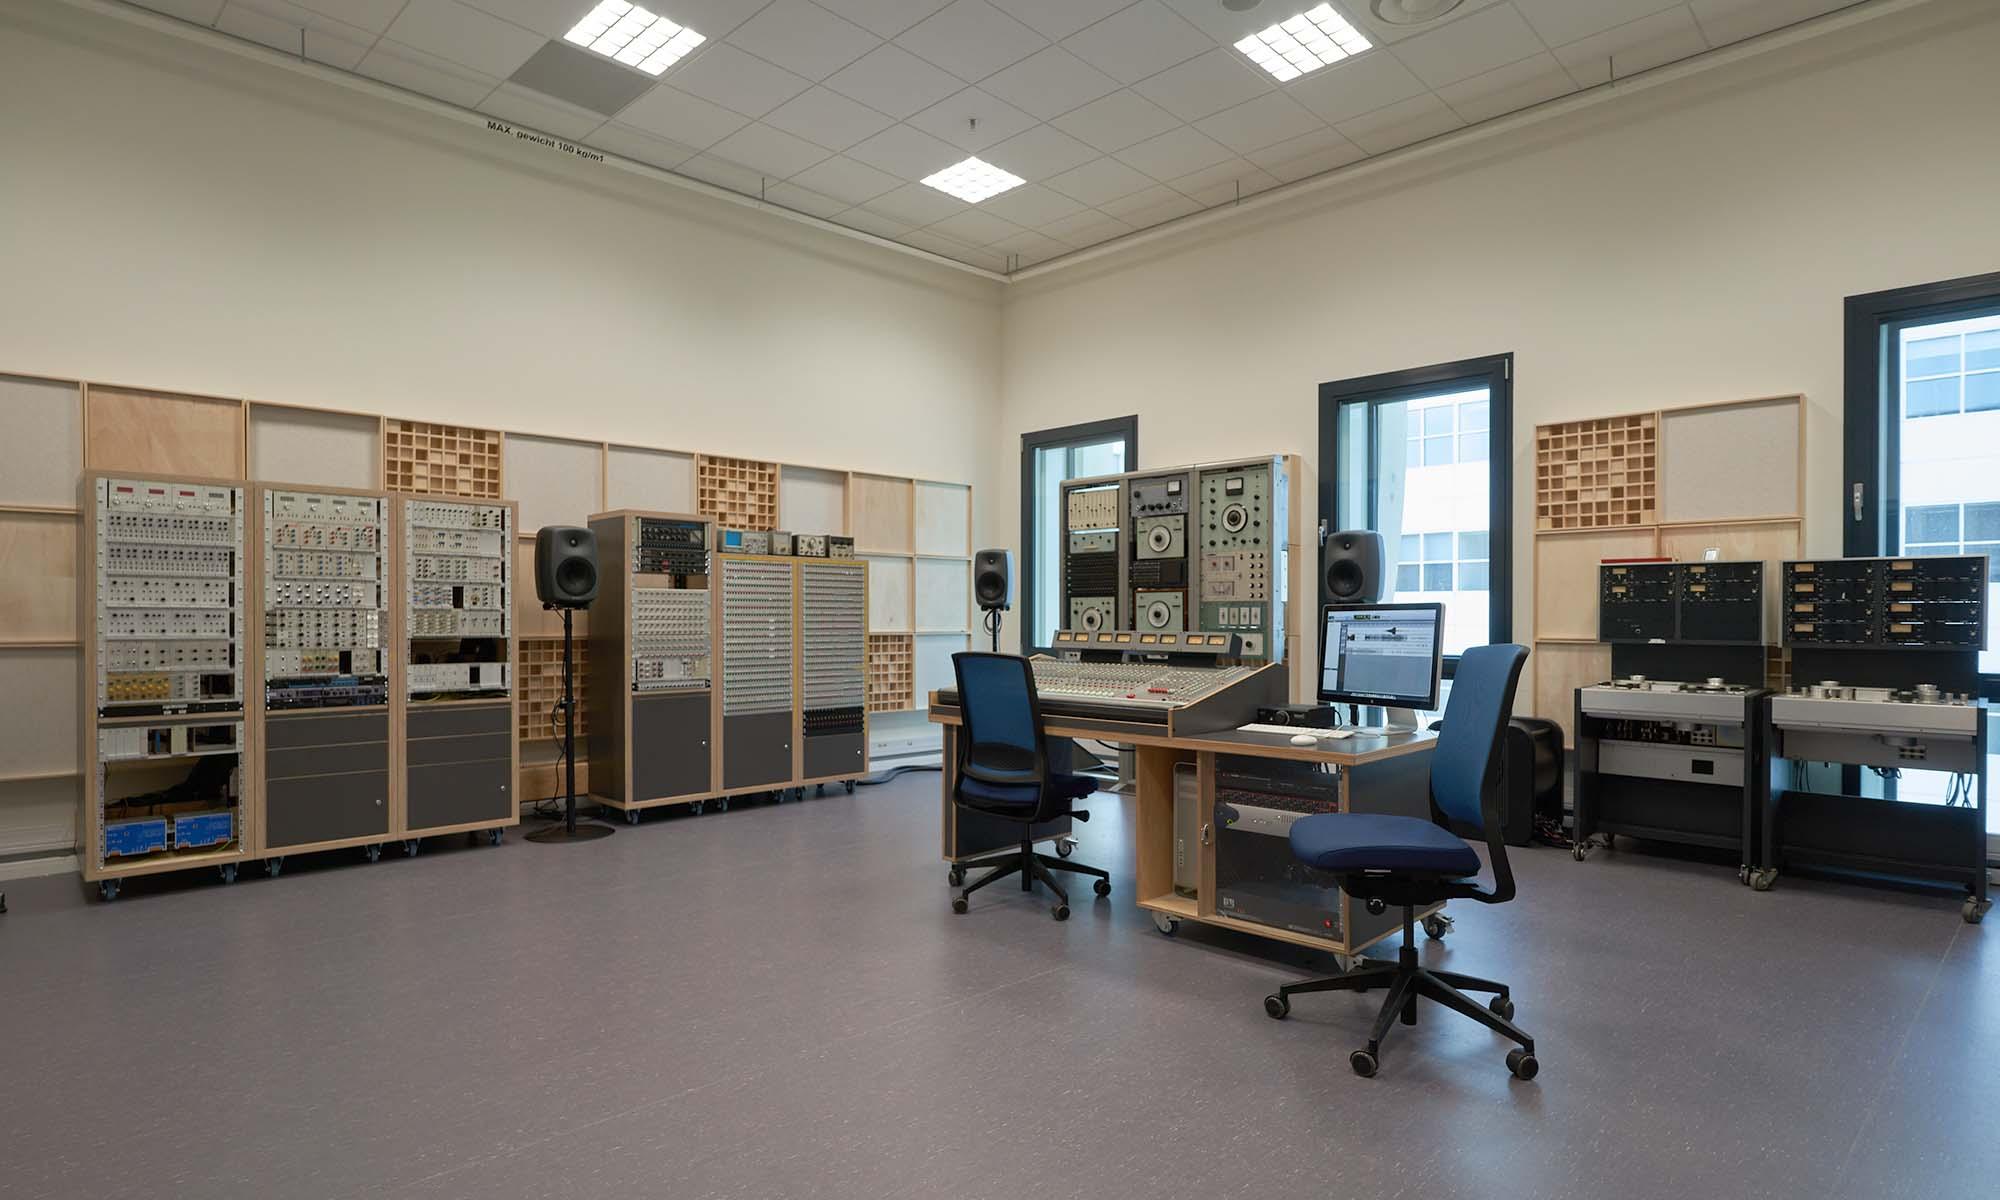 Institute of Sonology